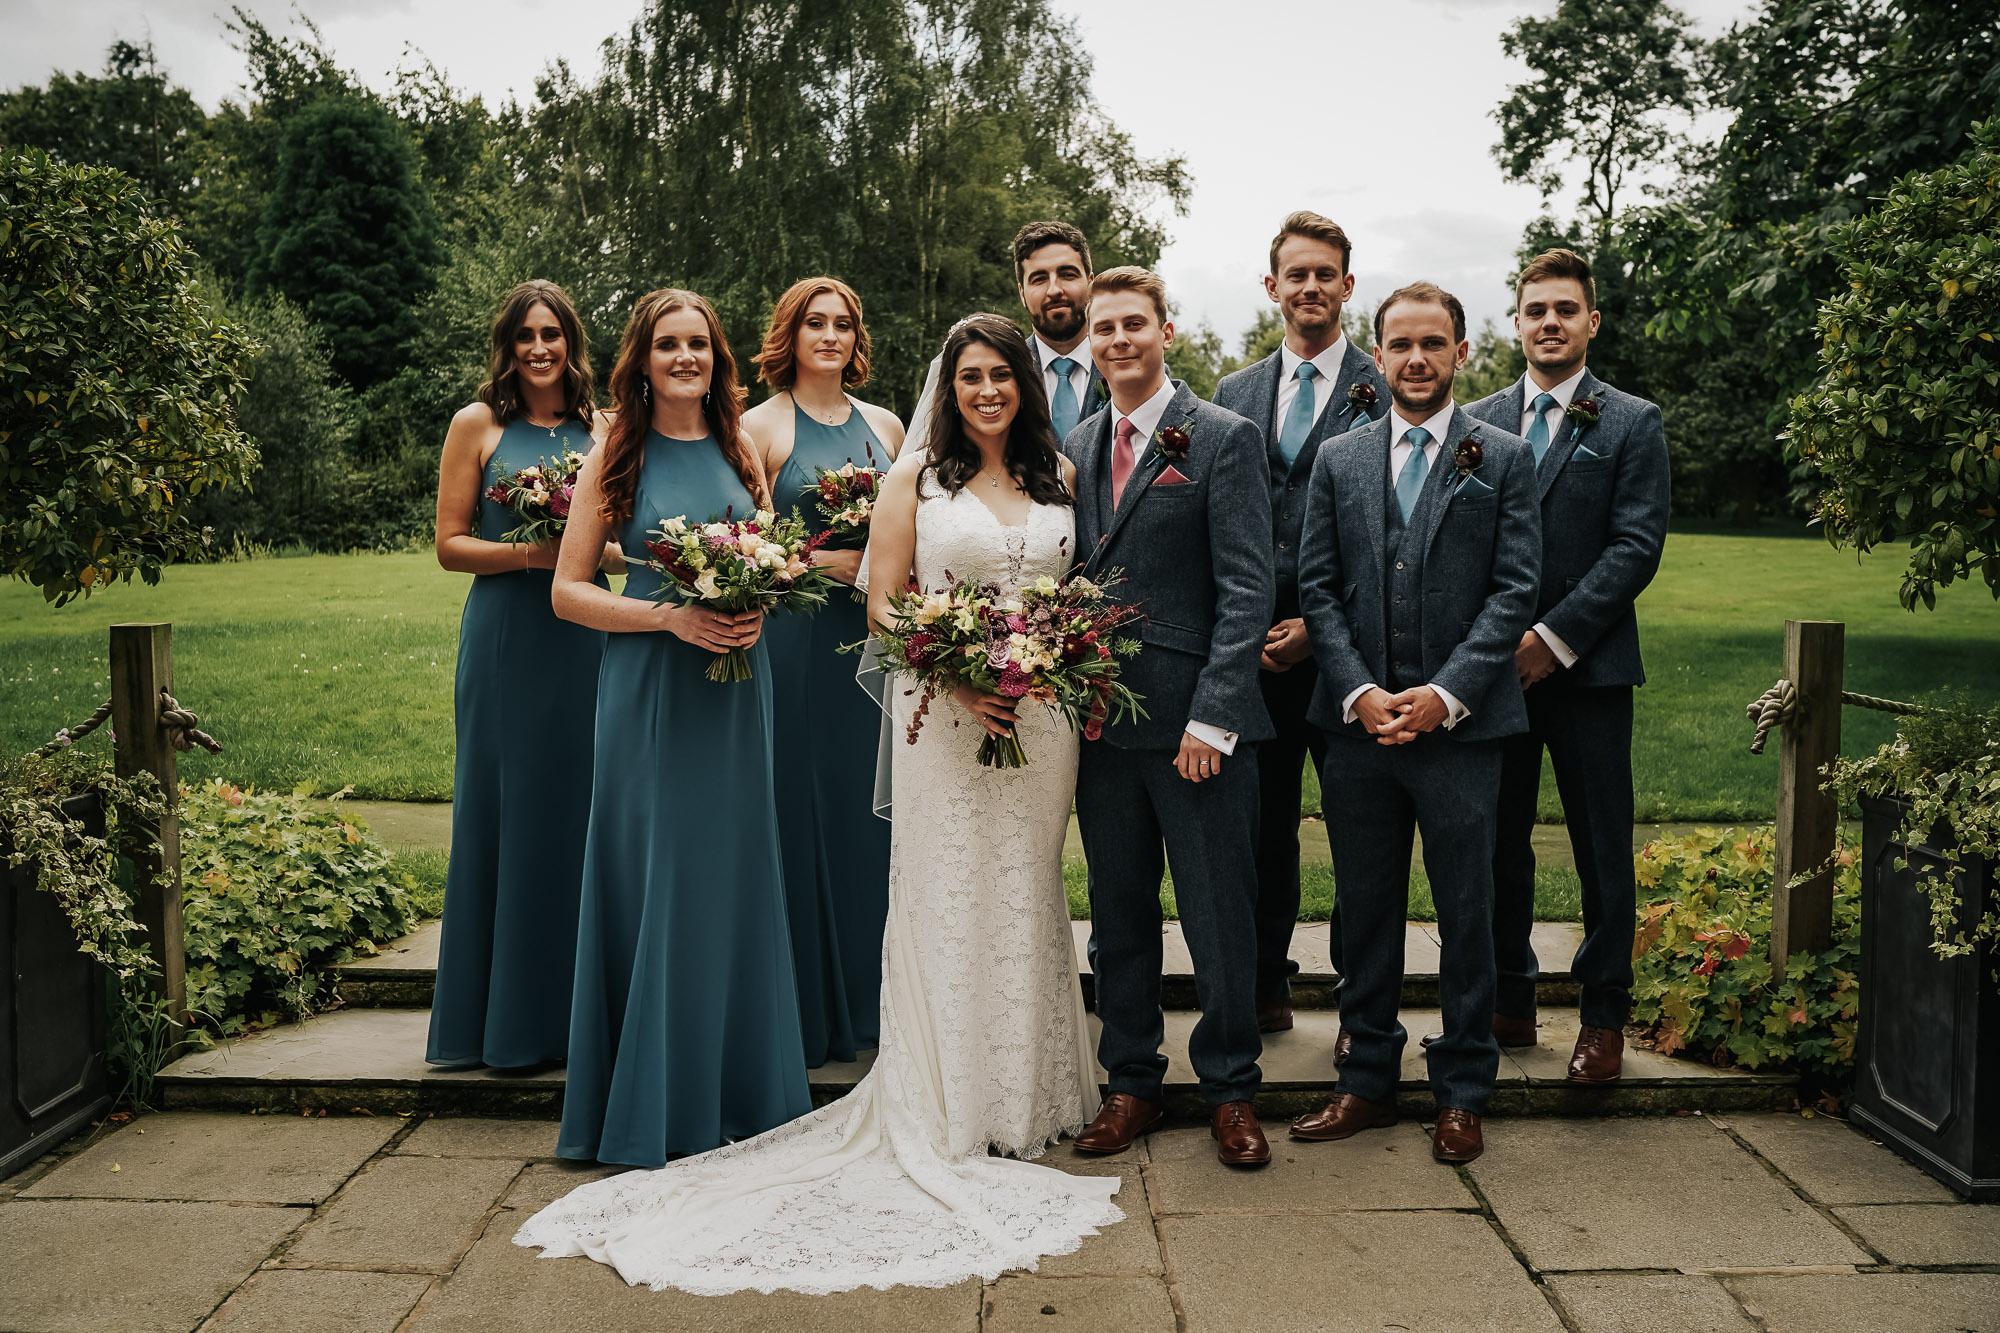 Oak tree of peover wedding photography cheshire wedding photographer (32 of 56).jpg